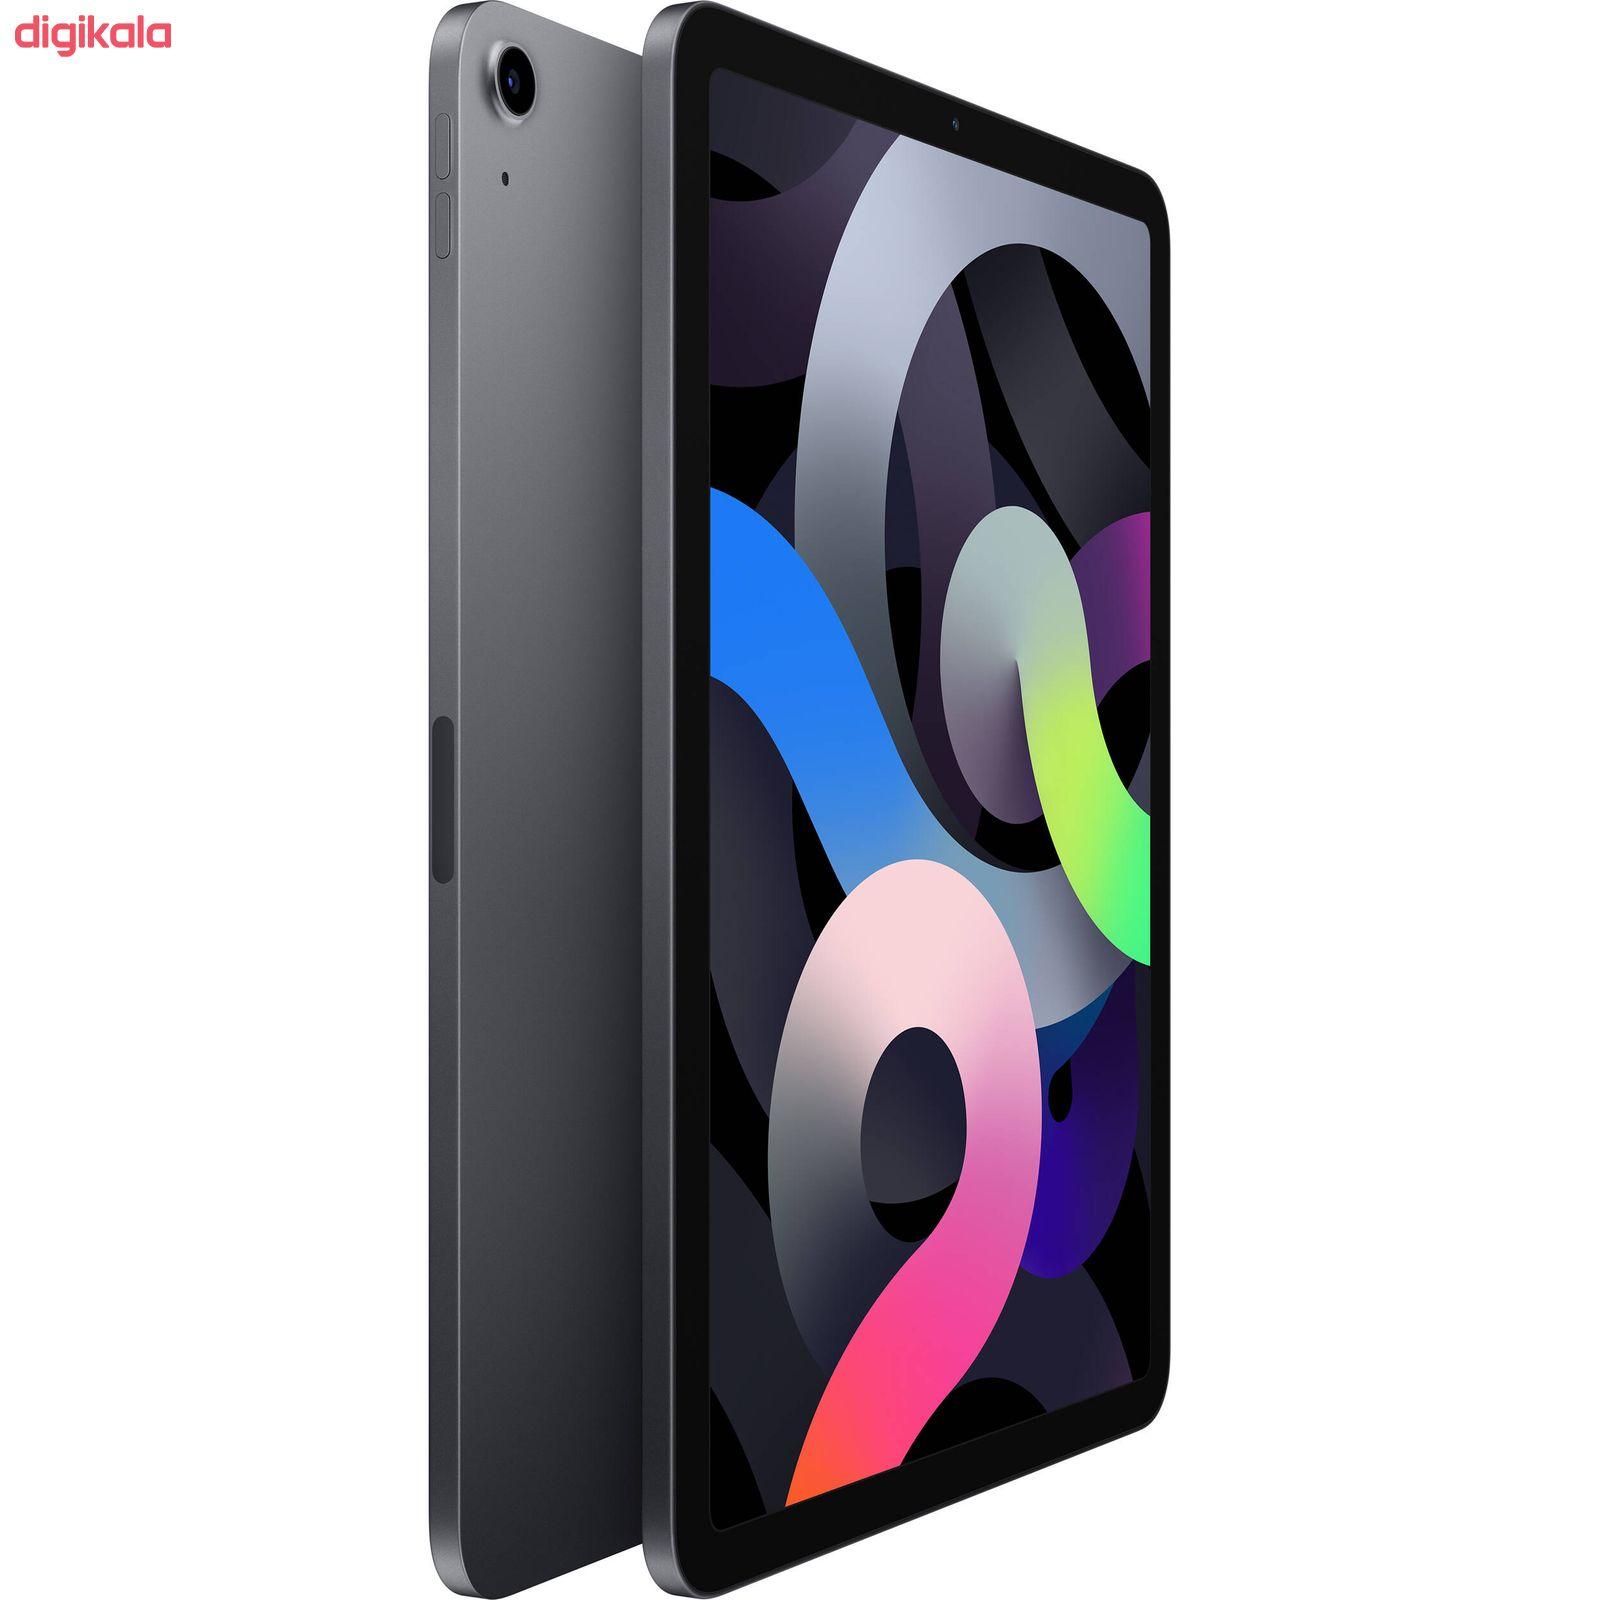 تبلت اپل مدل iPad Air 10.9 inch 2020 WiFi ظرفیت 64 گیگابایت  main 1 5